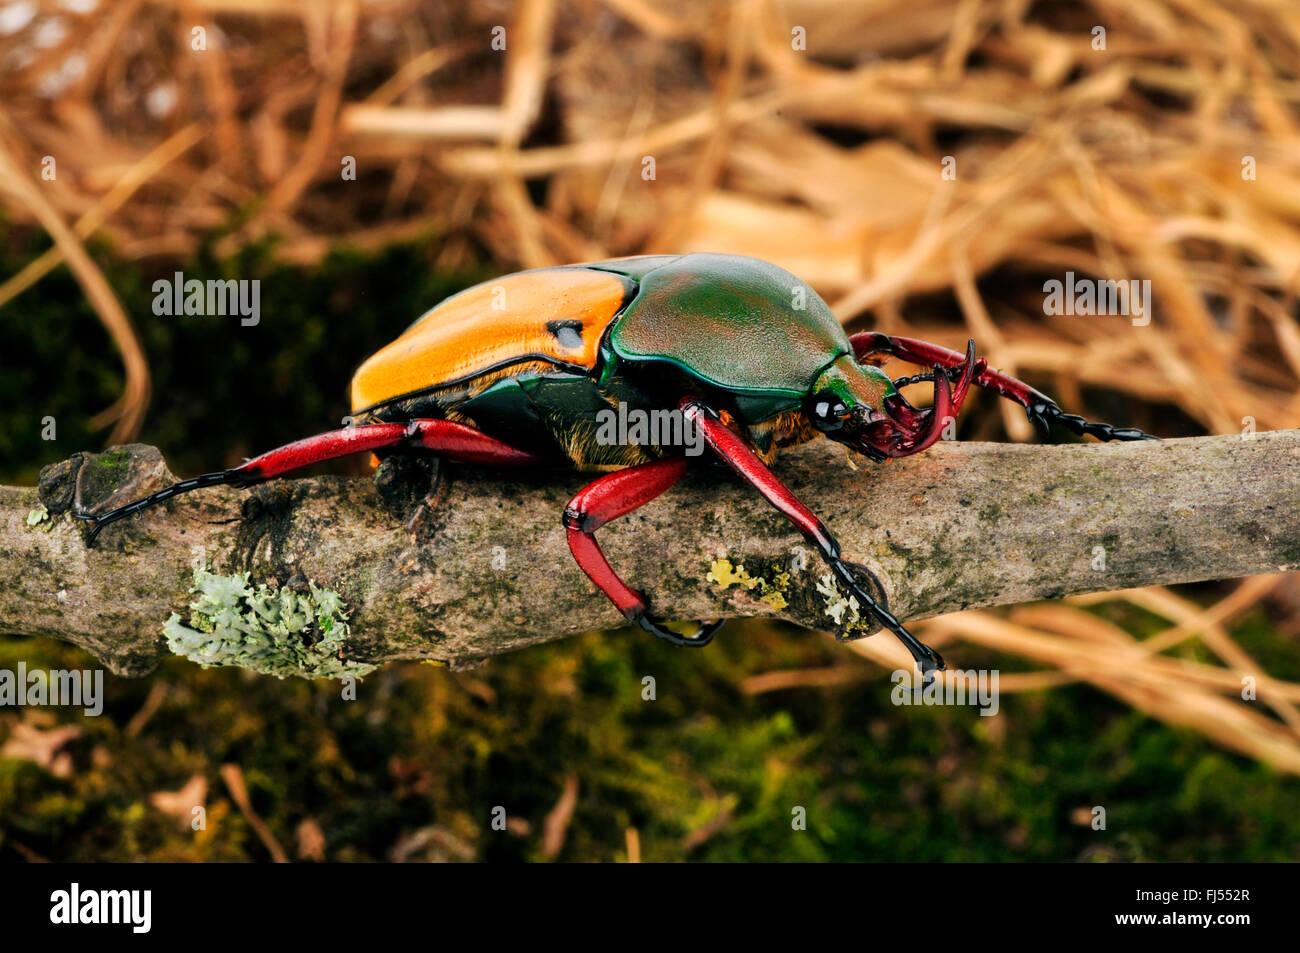 rose beetle; rose chafer (Eudicella tetraspilota), on a branch - Stock Image